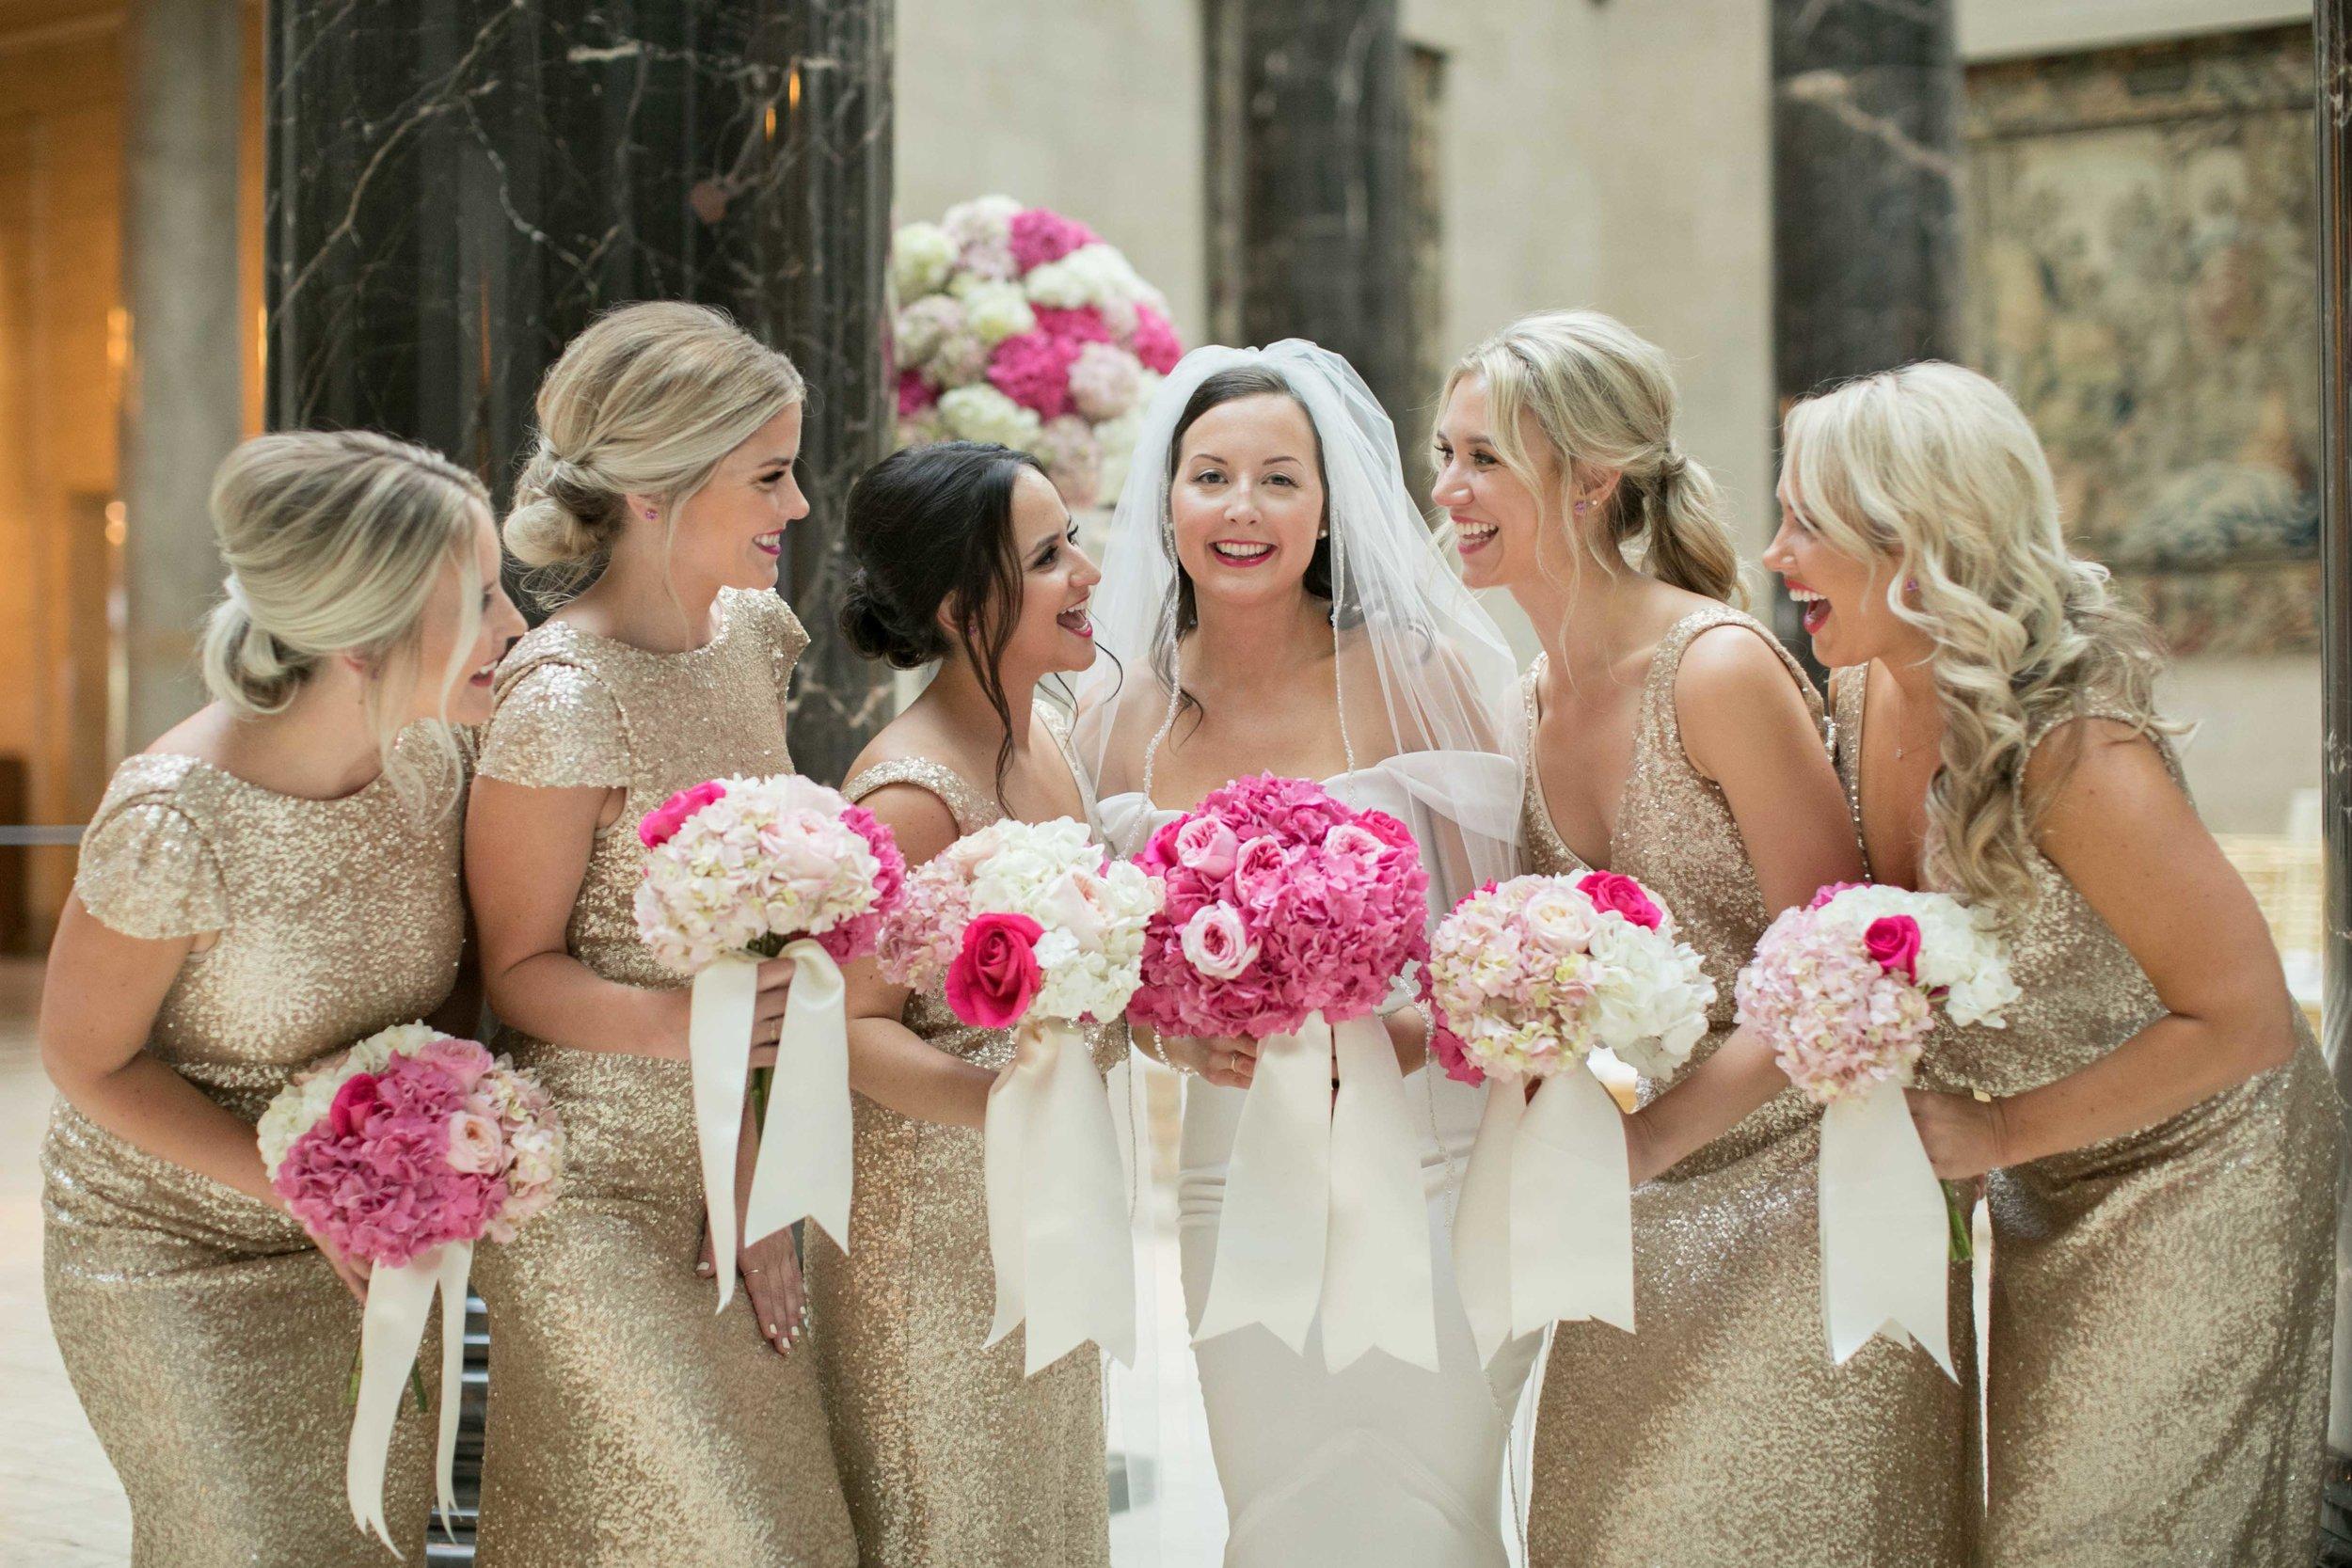 nelson-atkins-wedding-14.jpg